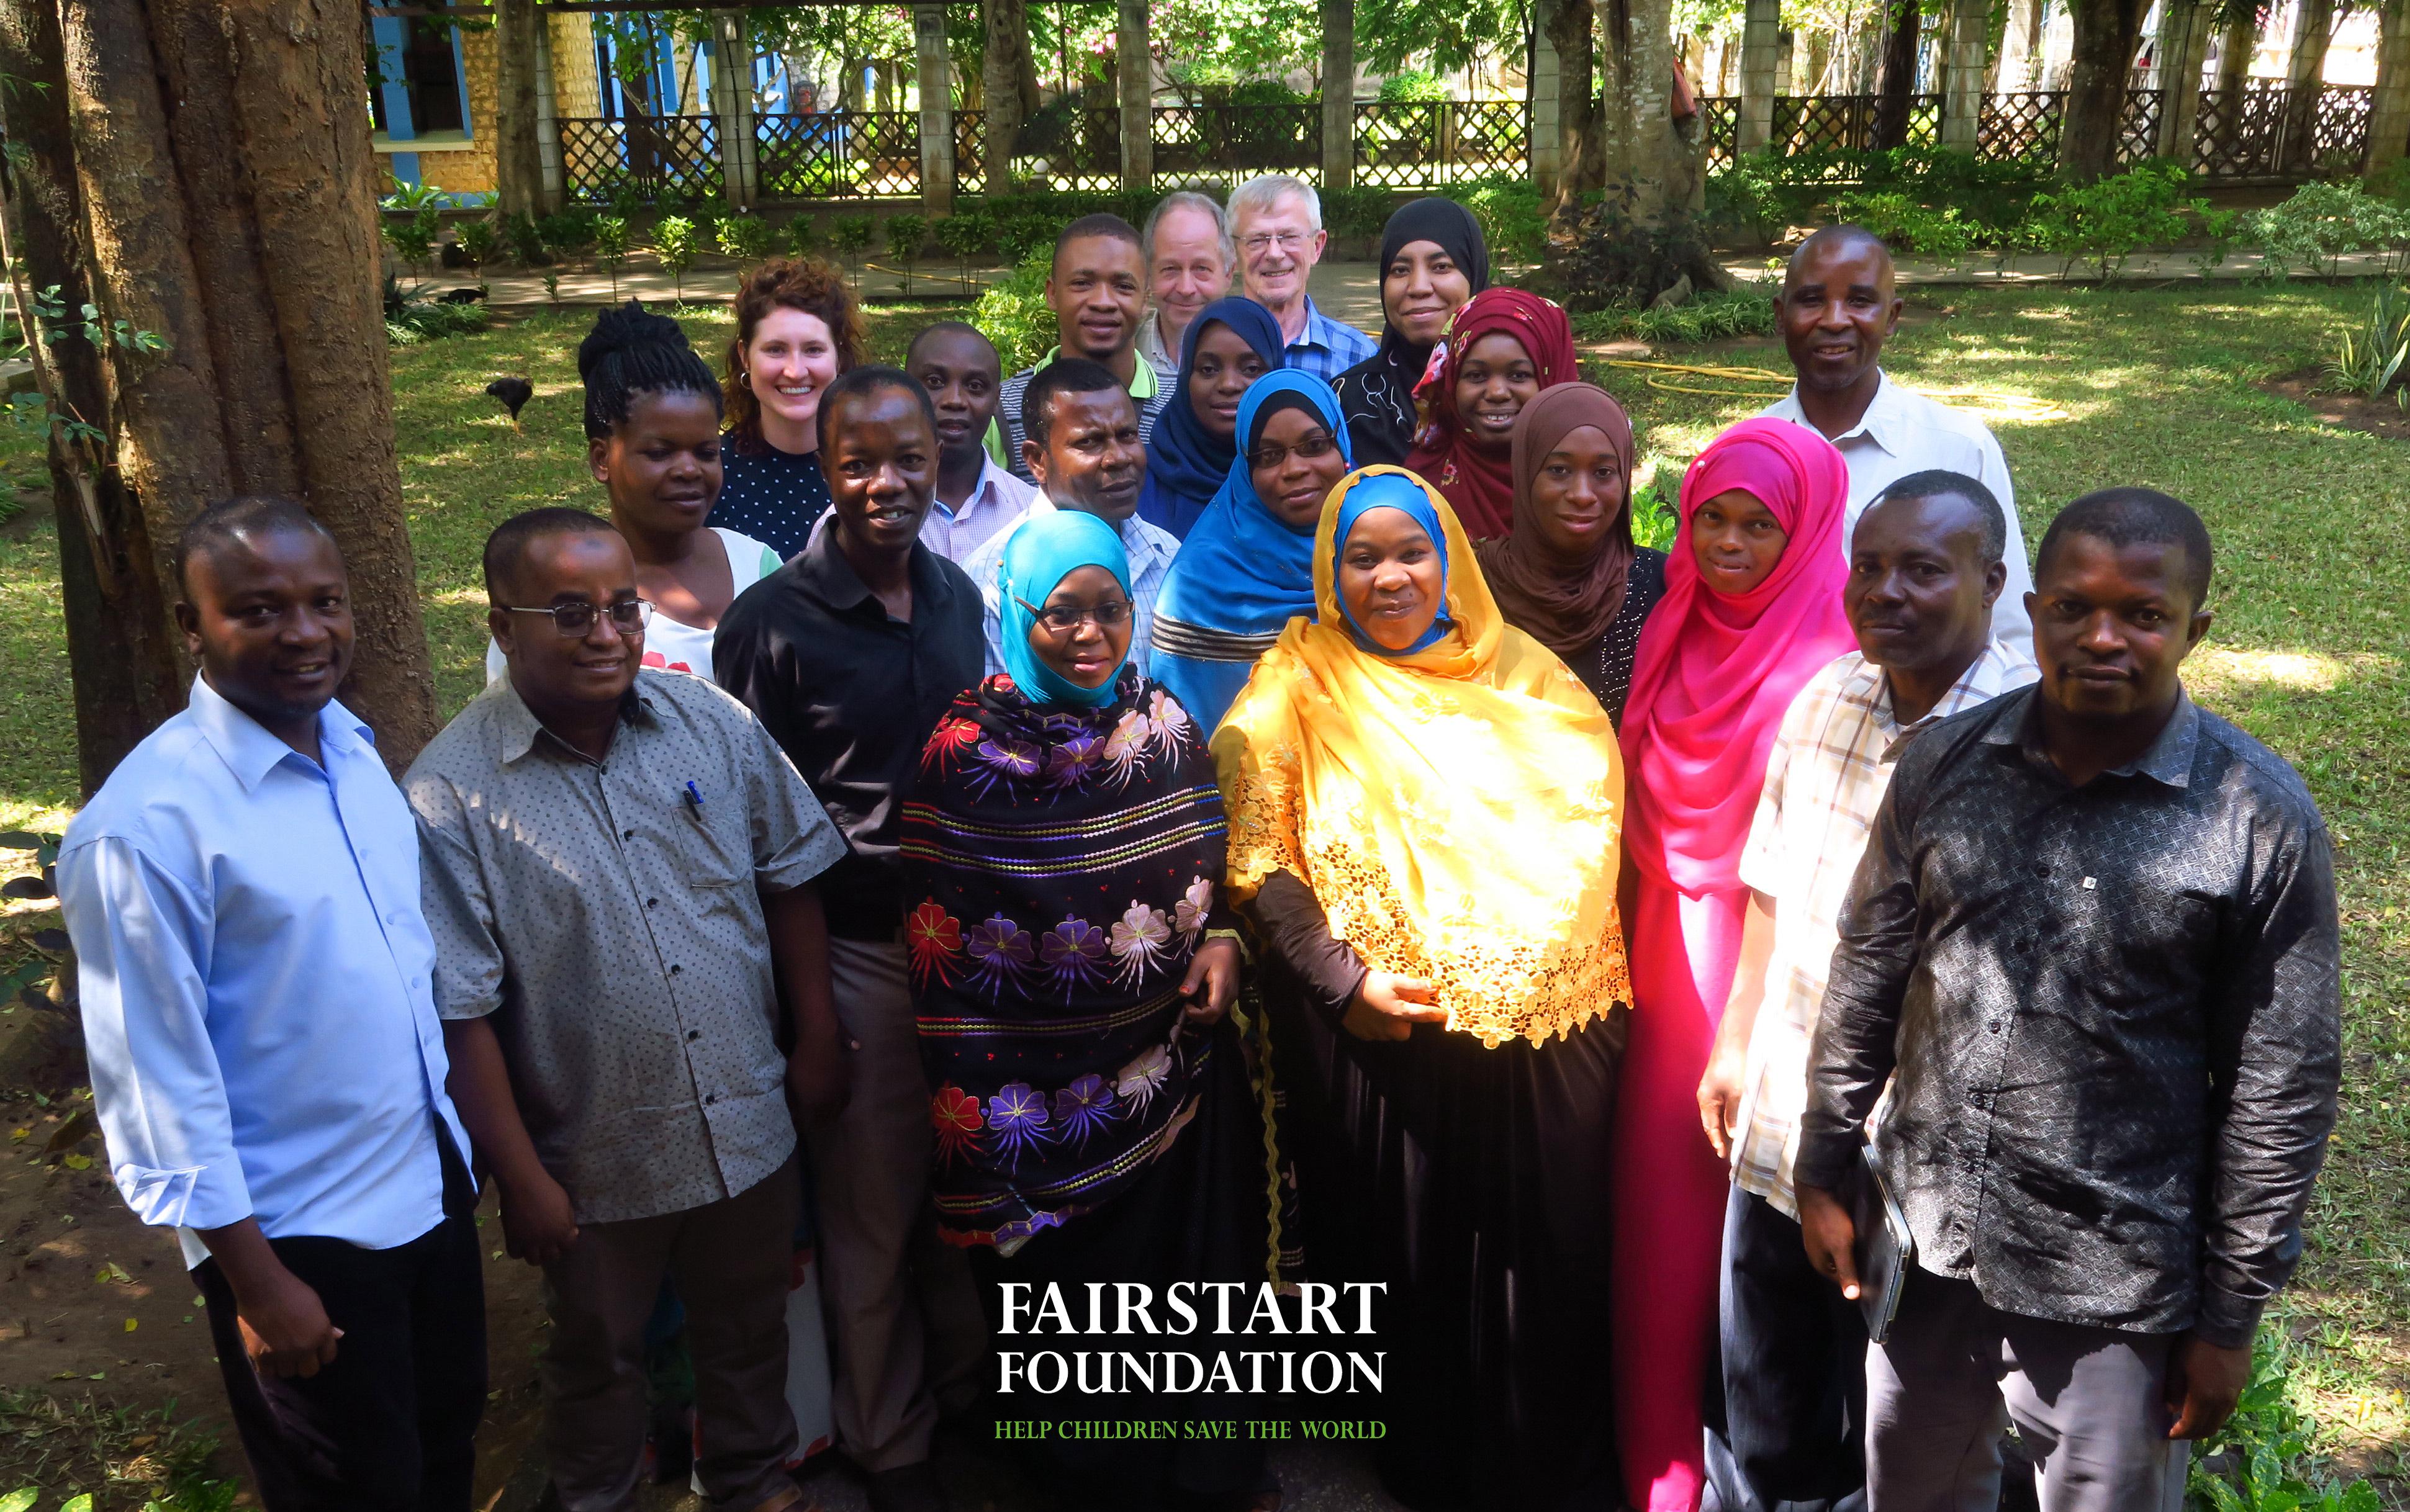 Vellykket opstart af nyt instruktørhold i SOS Børnebyerne i Zanzibar